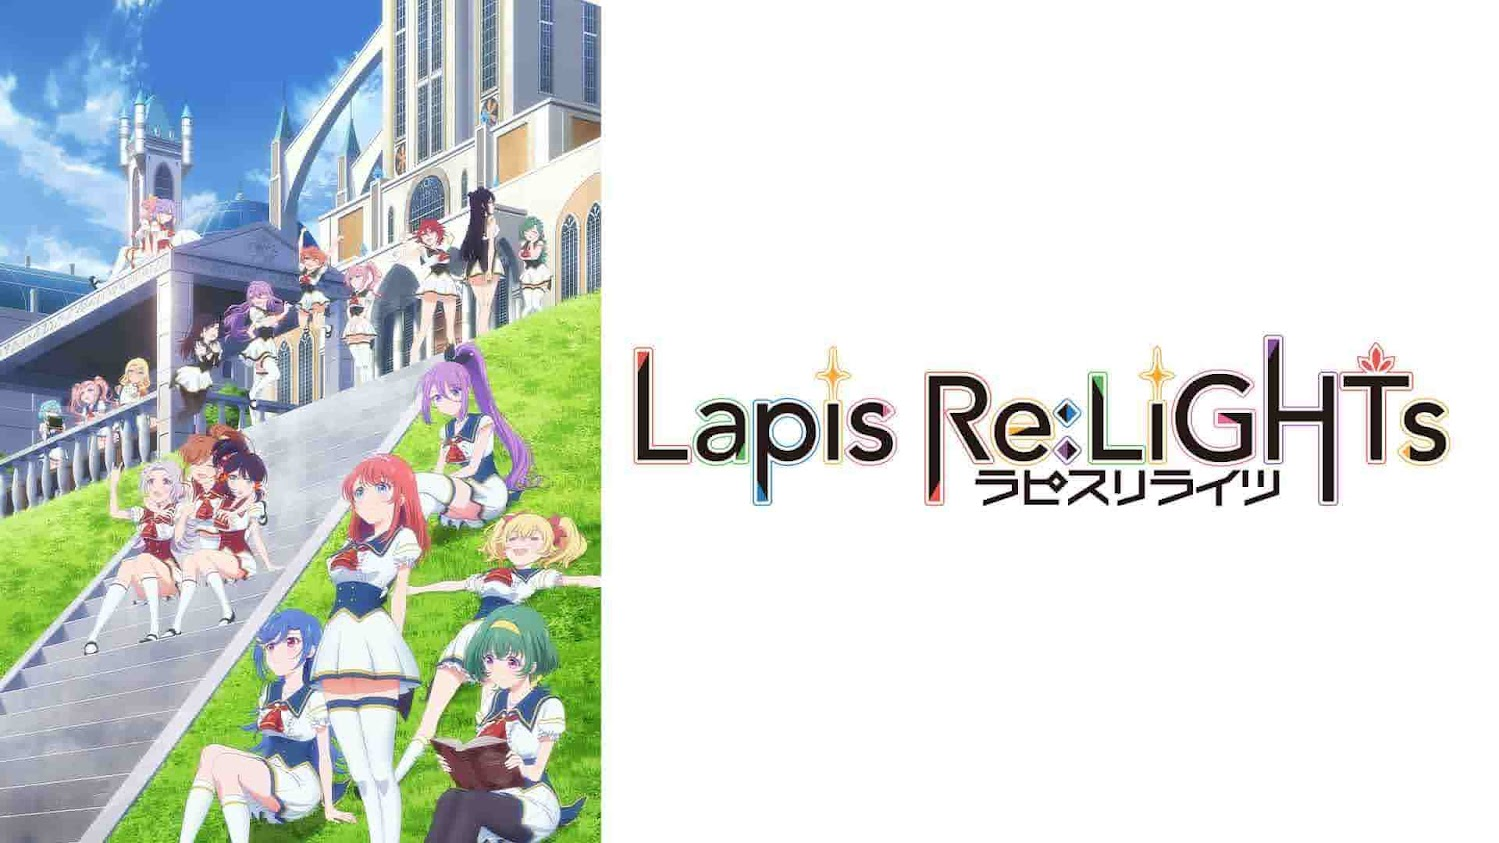 Lapis Re:LiGHTs|全話アニメ無料動画まとめ